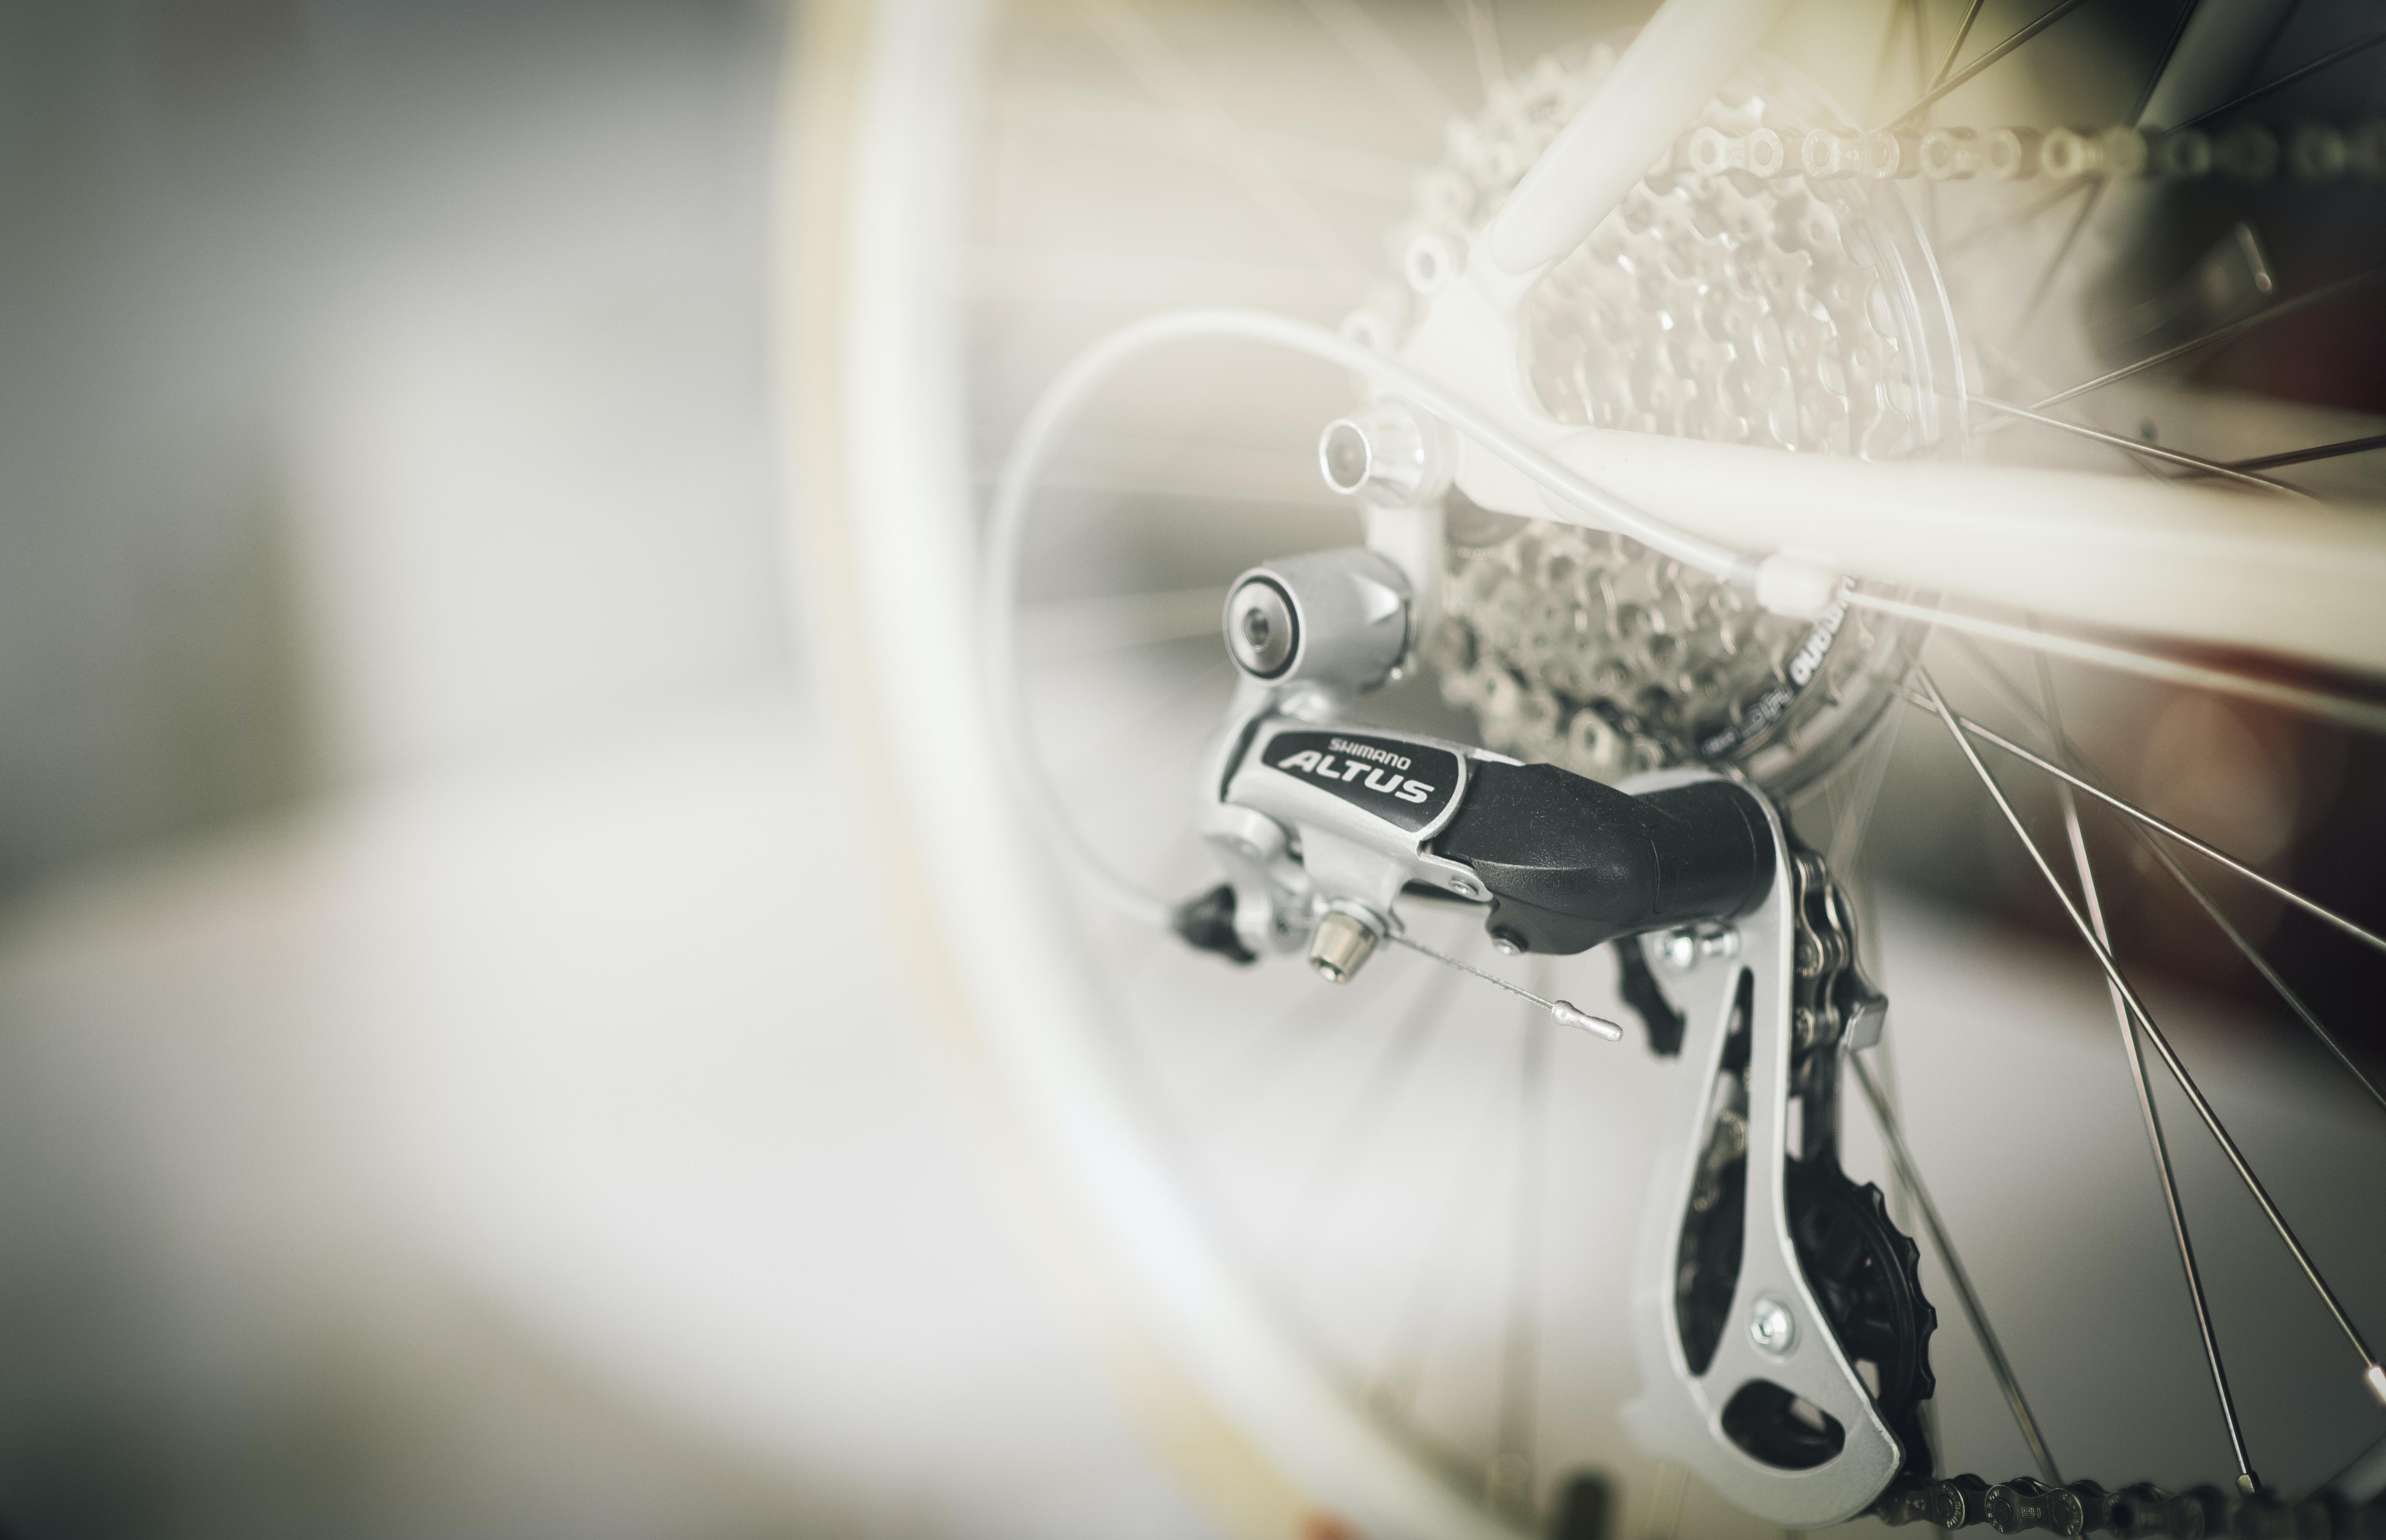 Altus bicycle chain